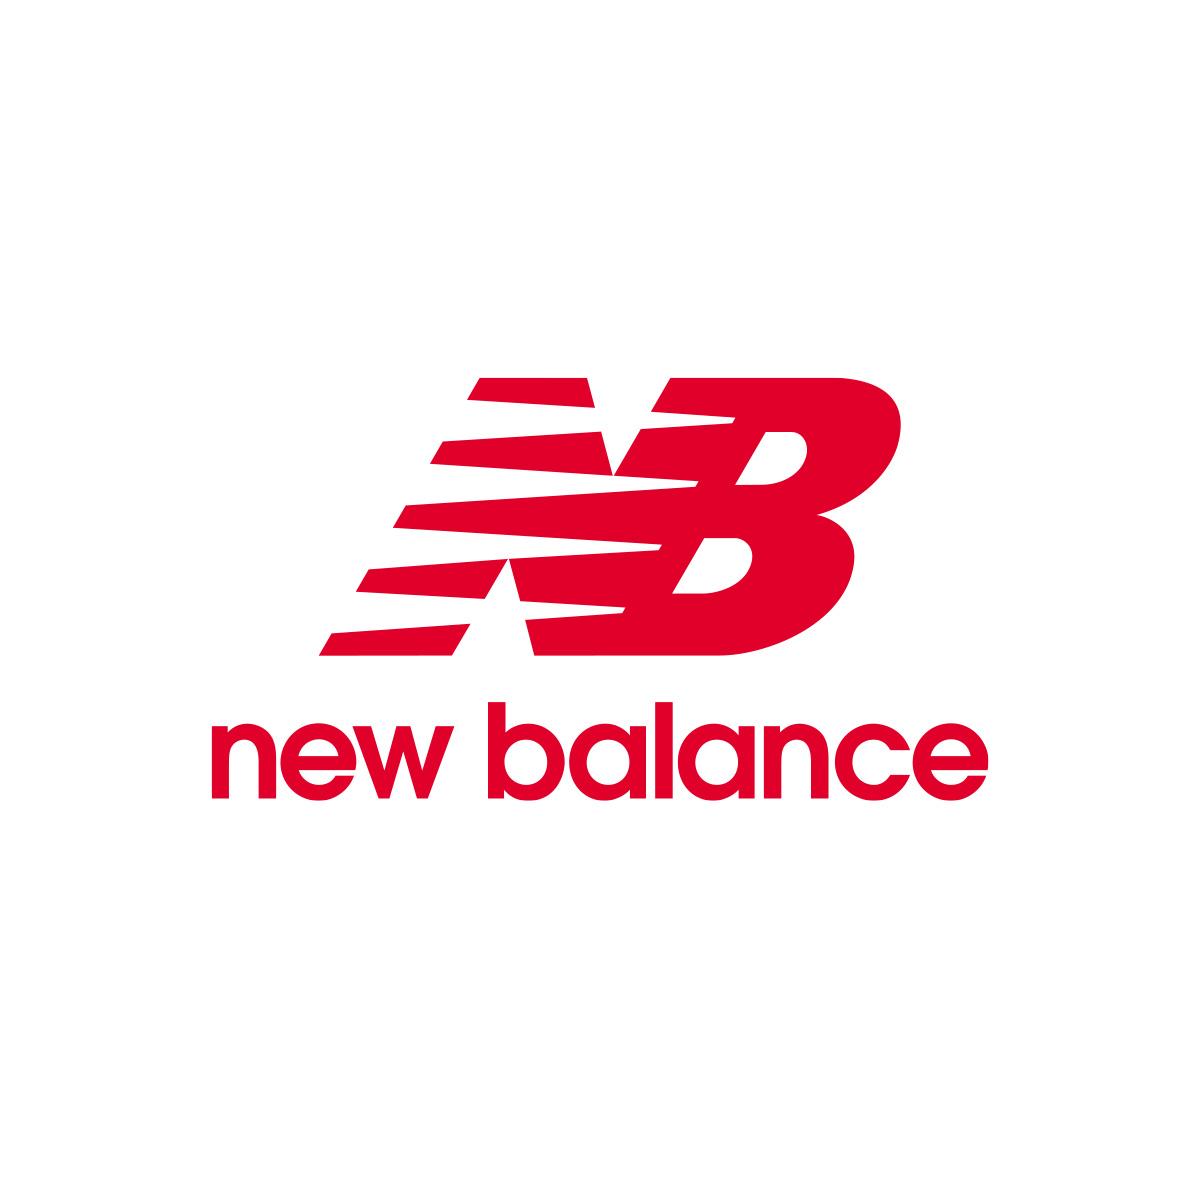 NB公式】ニューバランス | 店舗検索結果 New